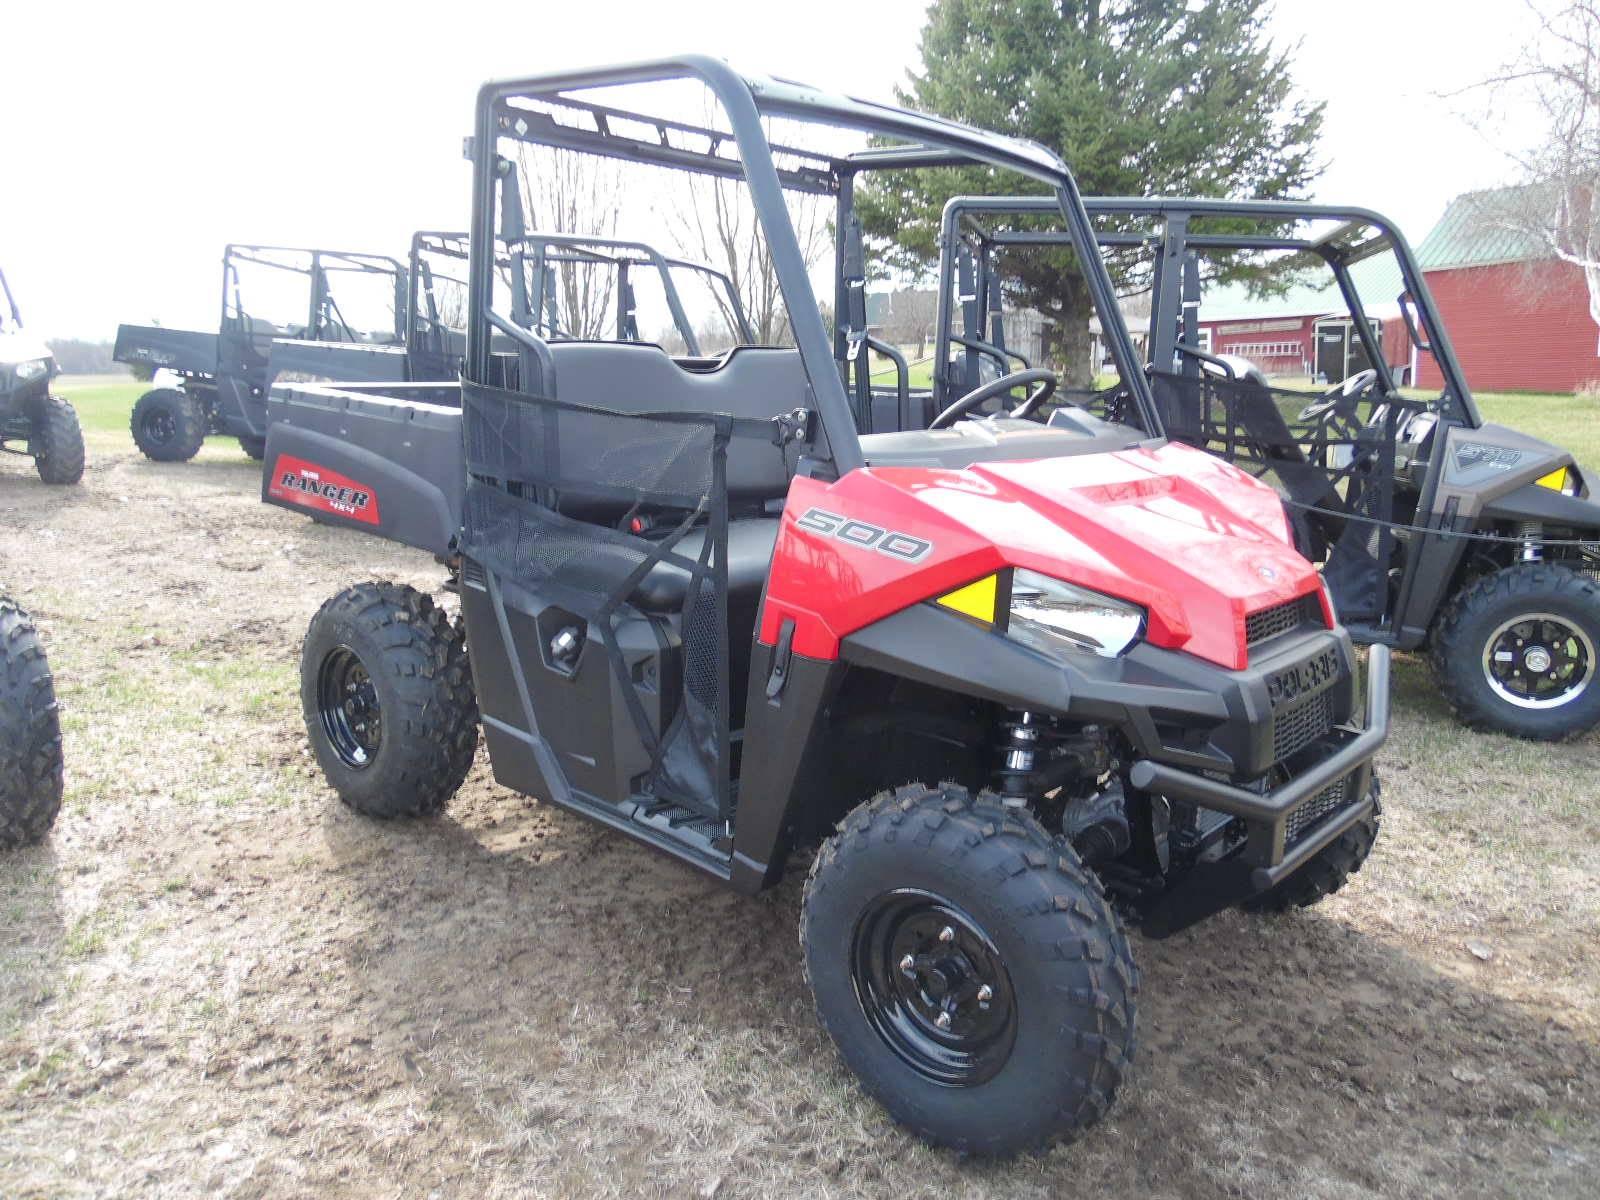 2019 Polaris Ranger 500 for sale 5908